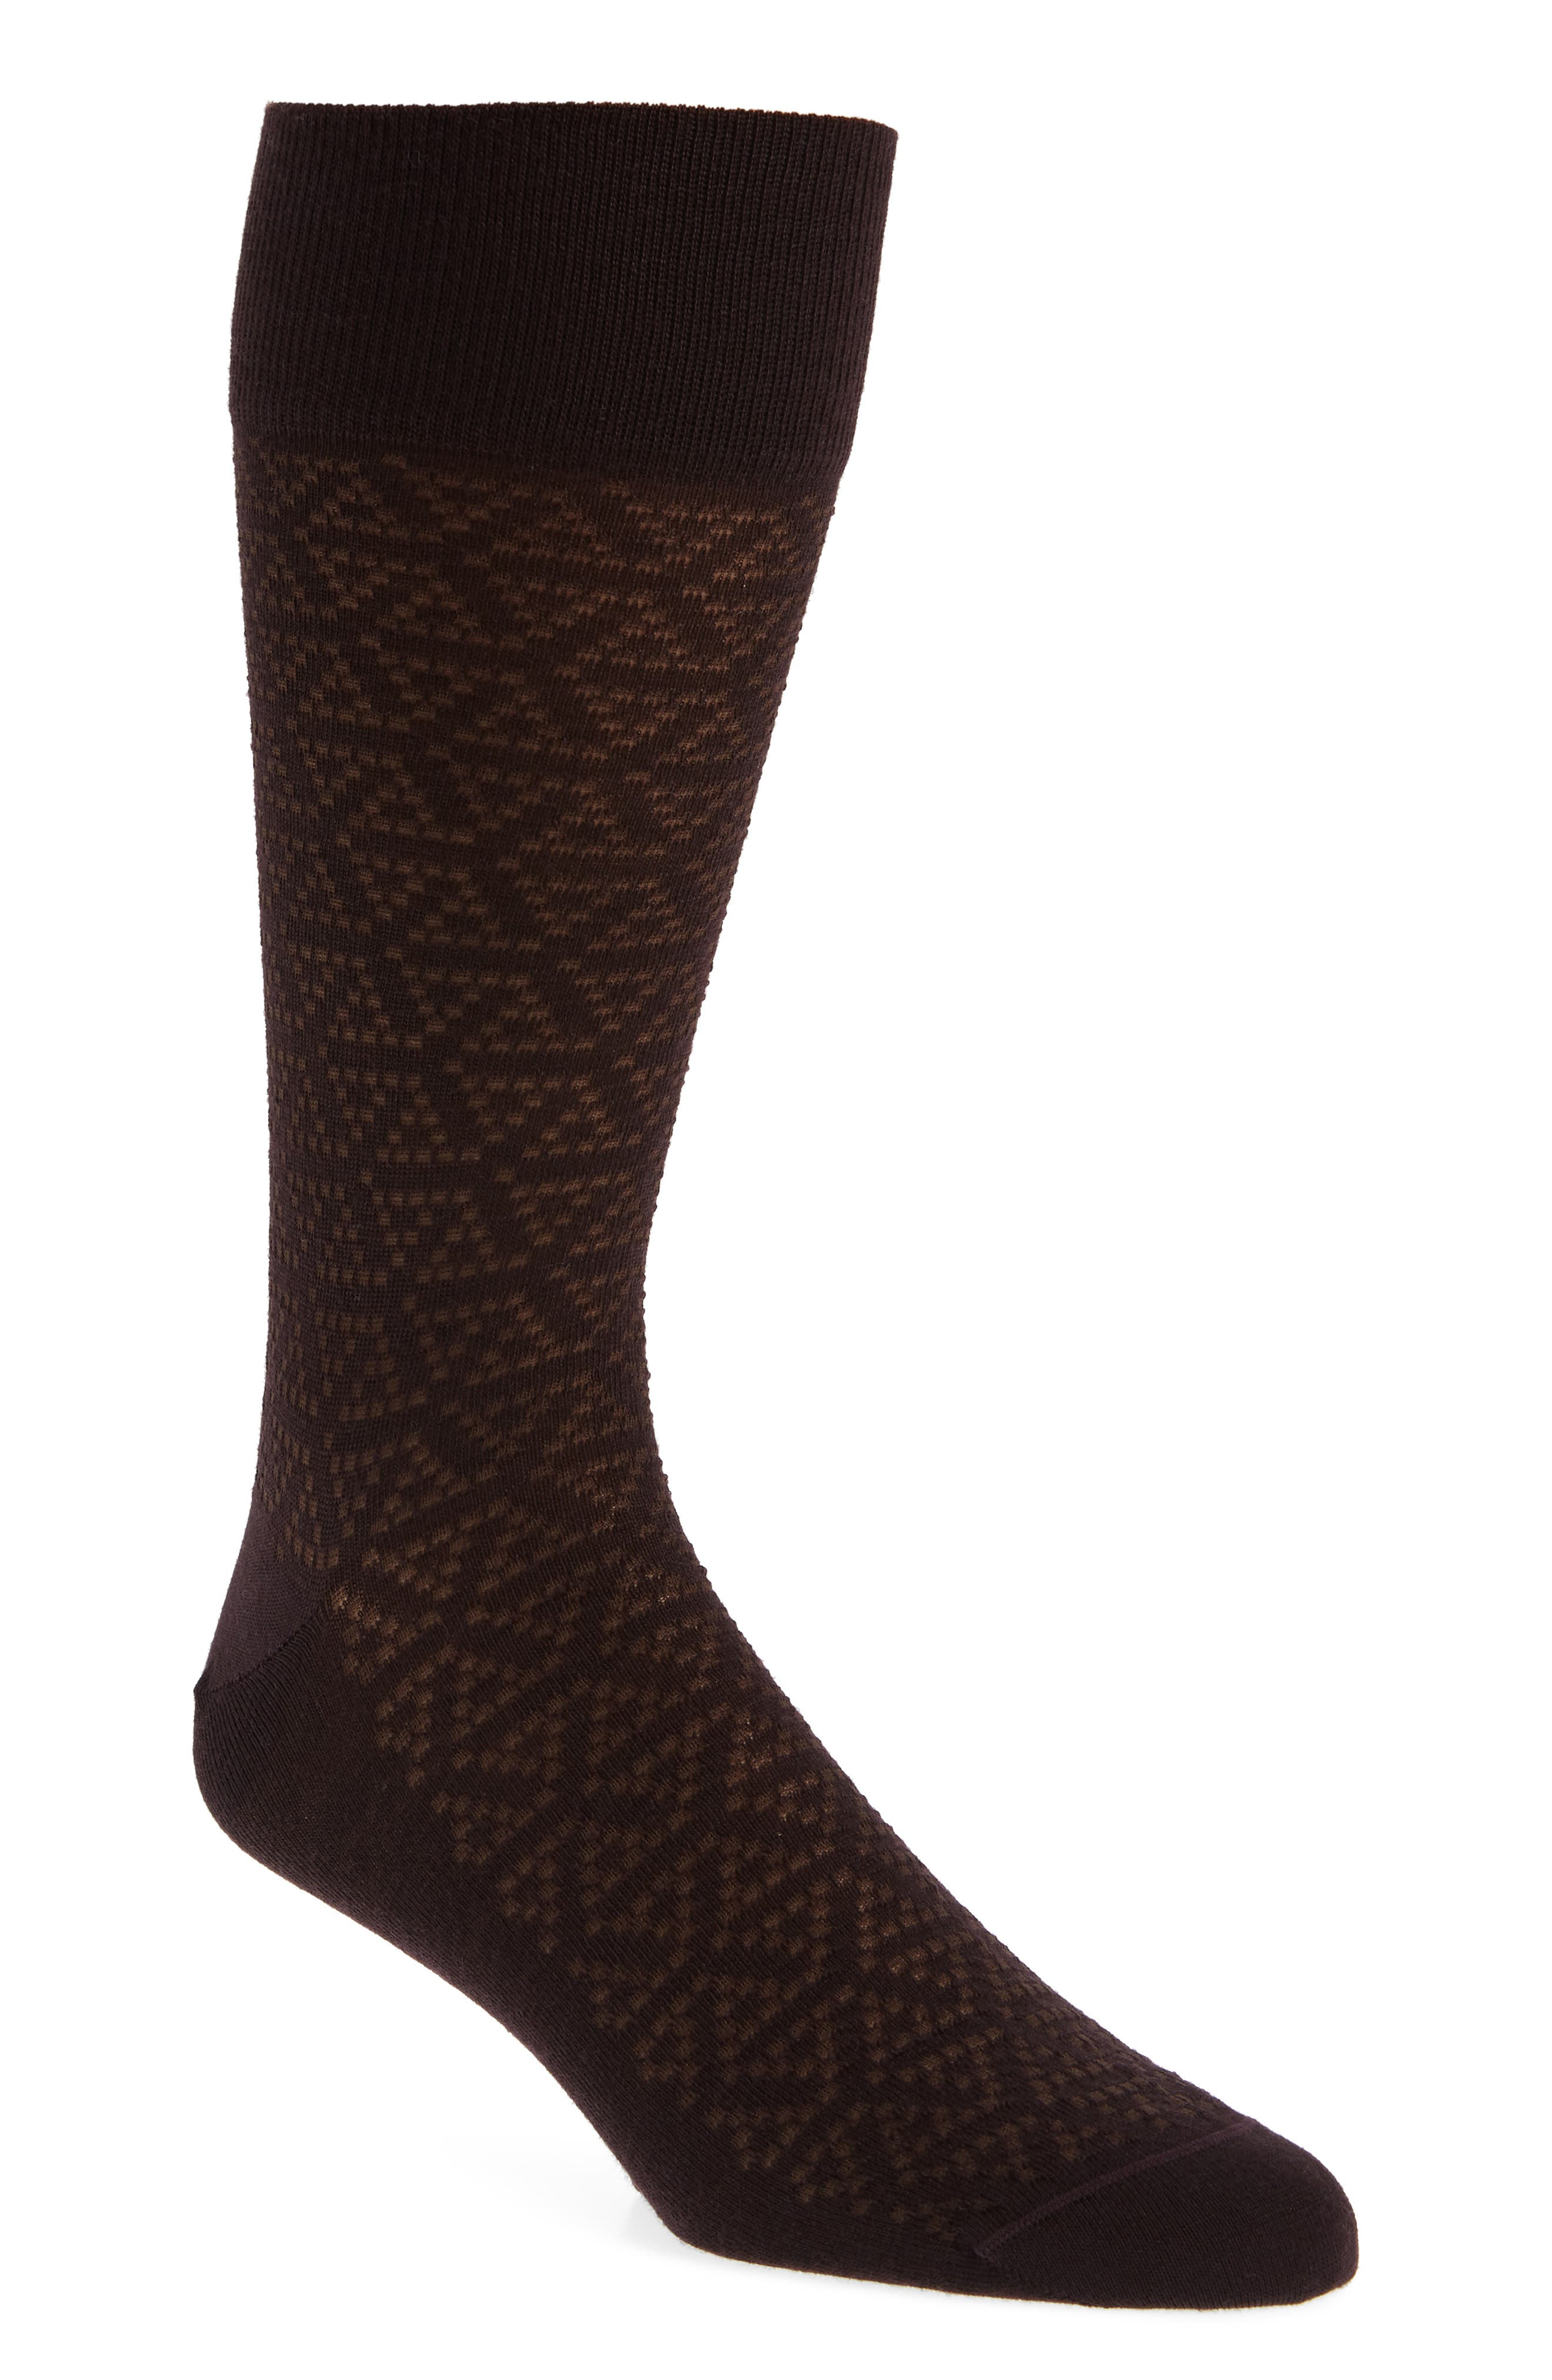 Pointed Triangle Socks,                         Main,                         color, BURGUNDY STEM